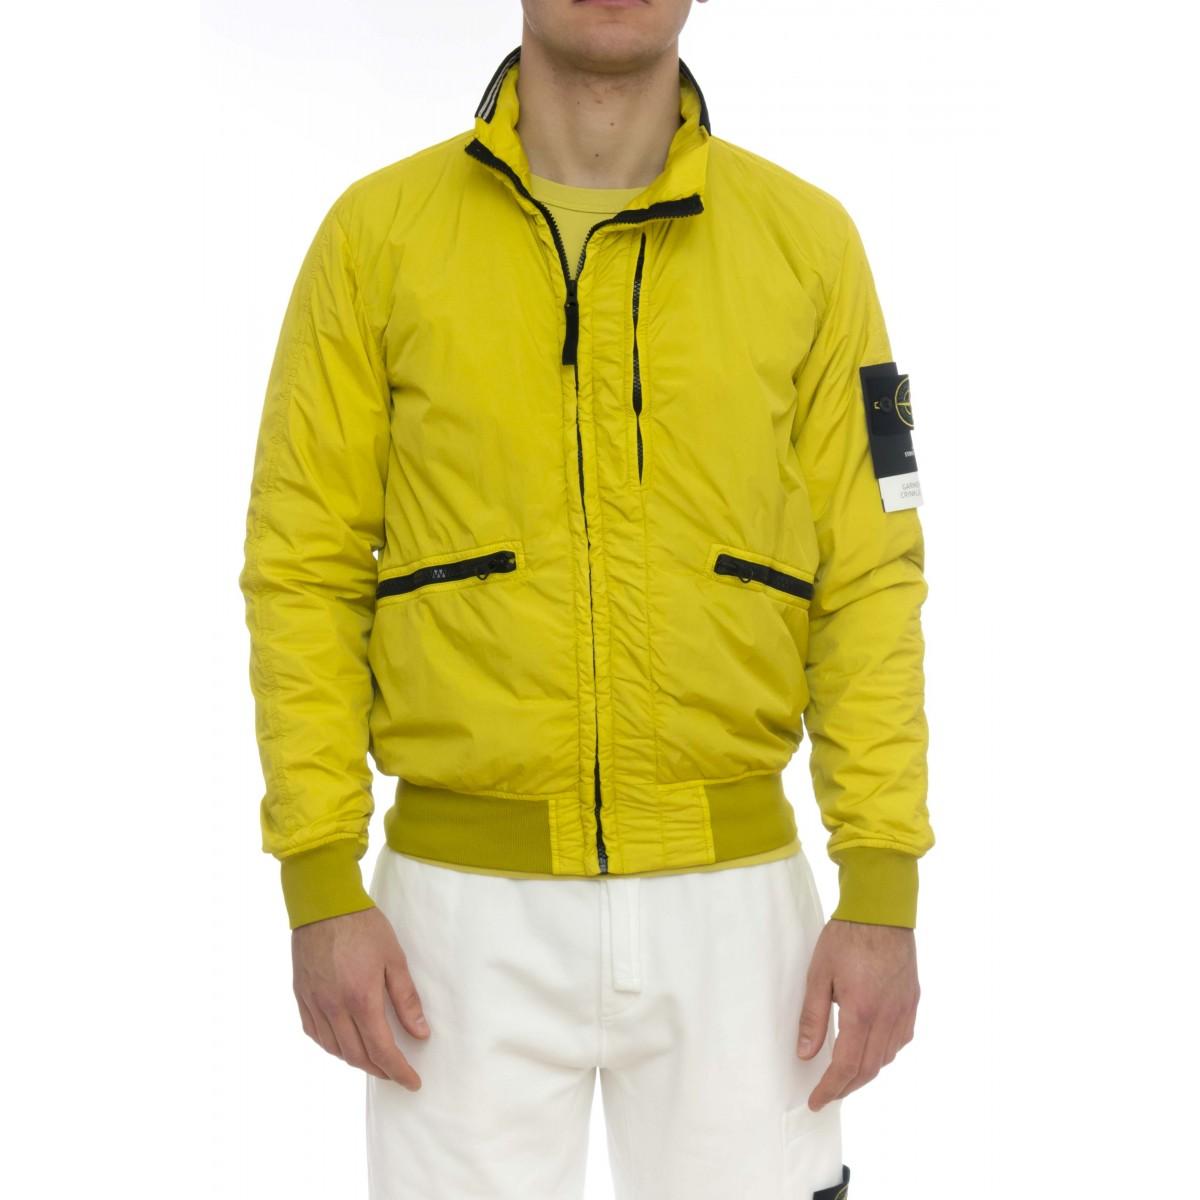 Giubbini - 40930 crinkle nylon accoppiato jersey